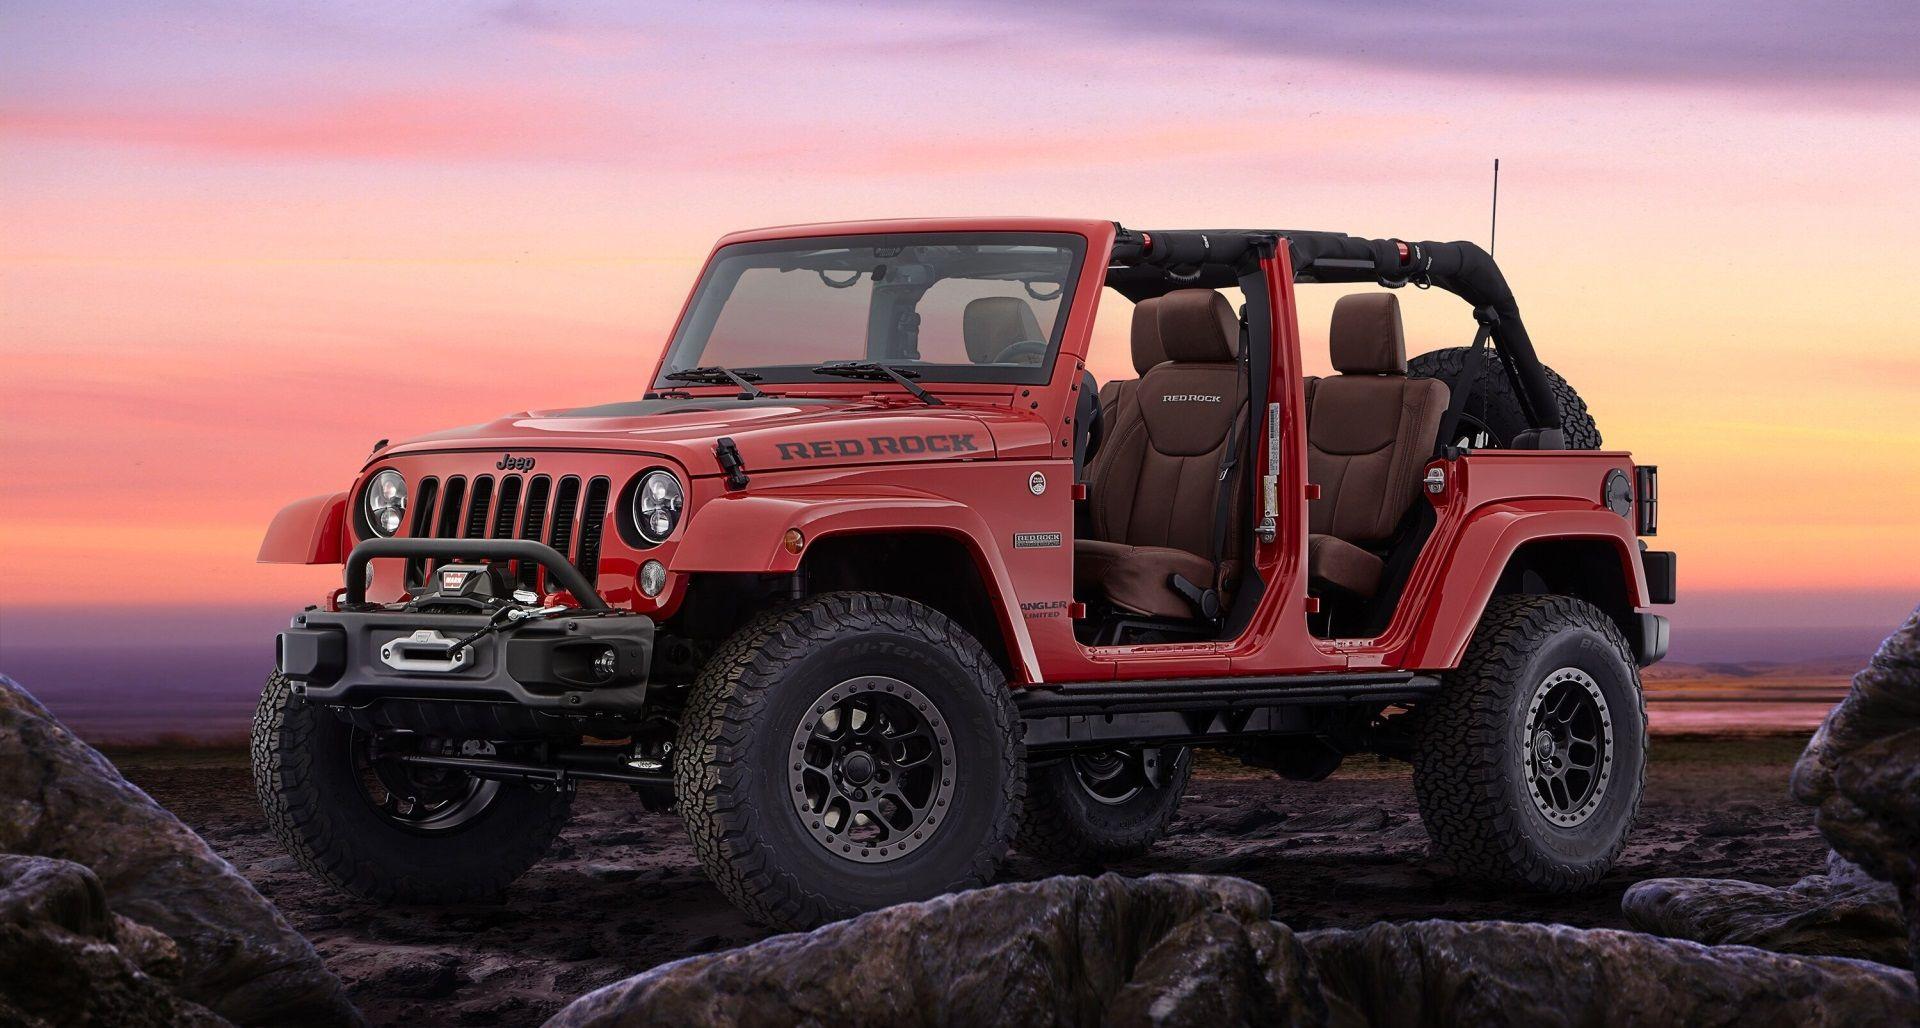 1920x1028 Jeep Red Rock Wallpaper Hd Top Jeep Wrangler Rubicon Jeep Wrangler 2017 Jeep Wrangler